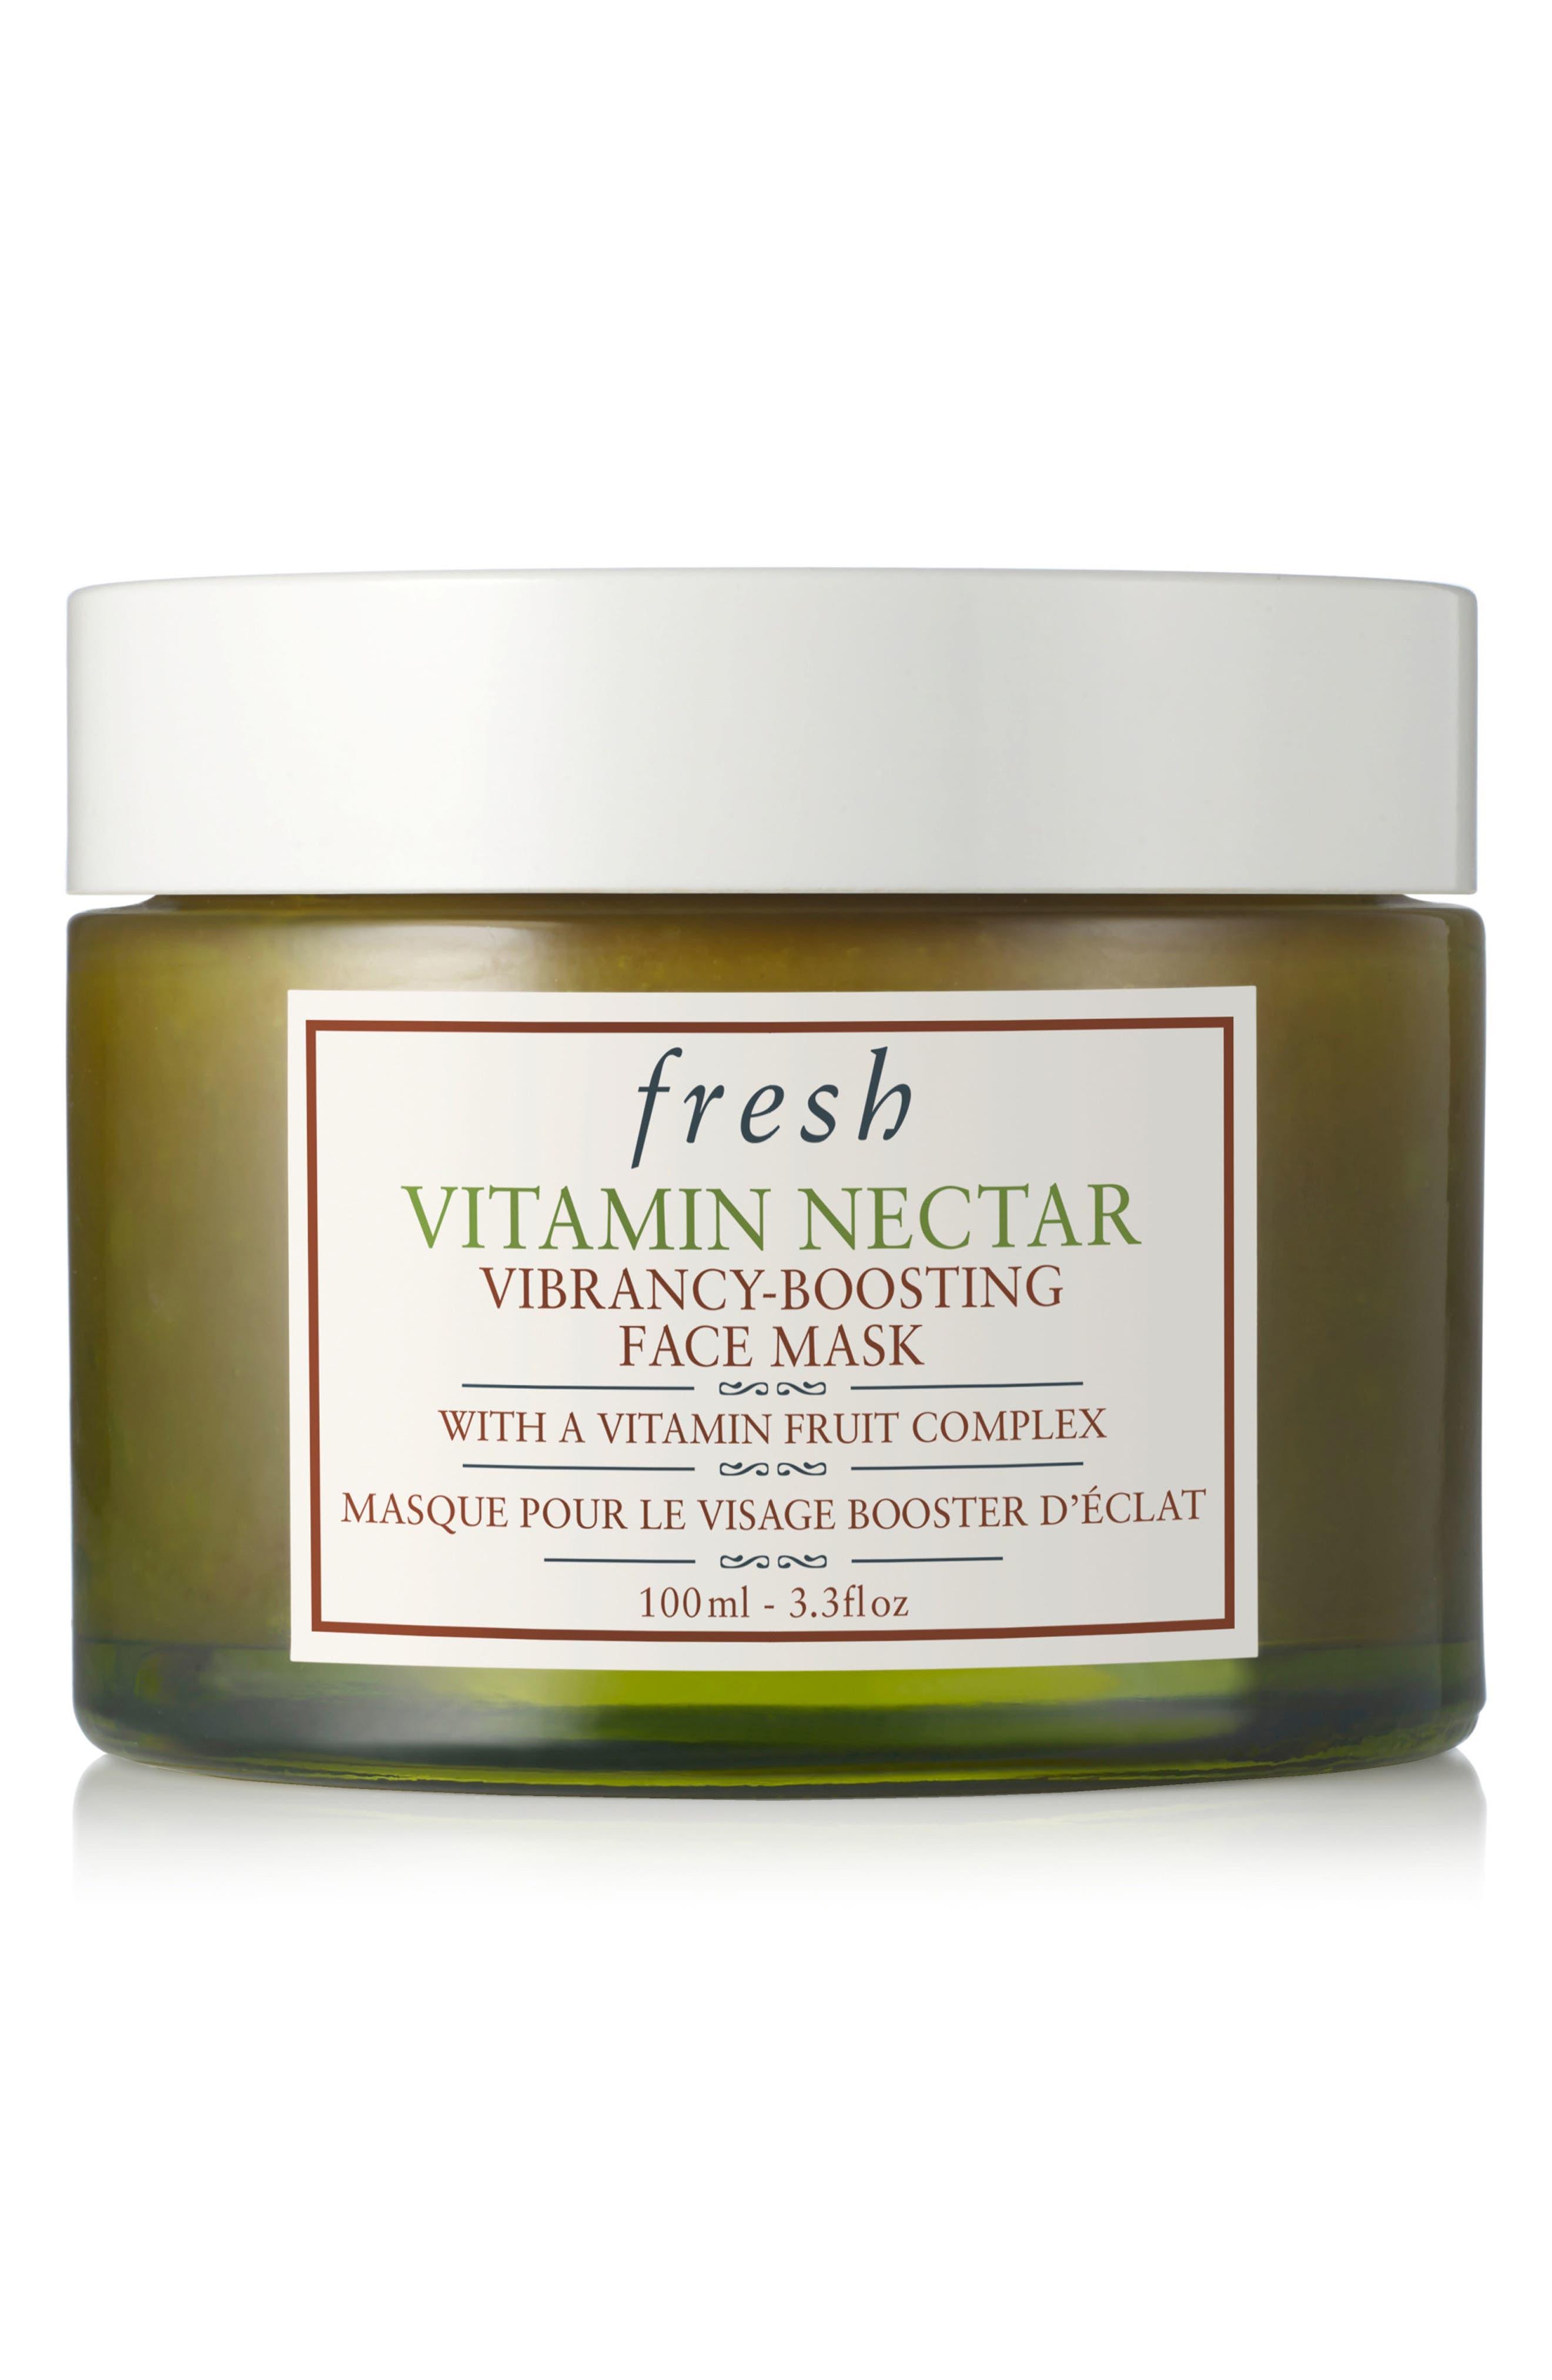 Fresh Vitamin Nectar Vibrancy-Boosting Face Mask, Size 1 oz